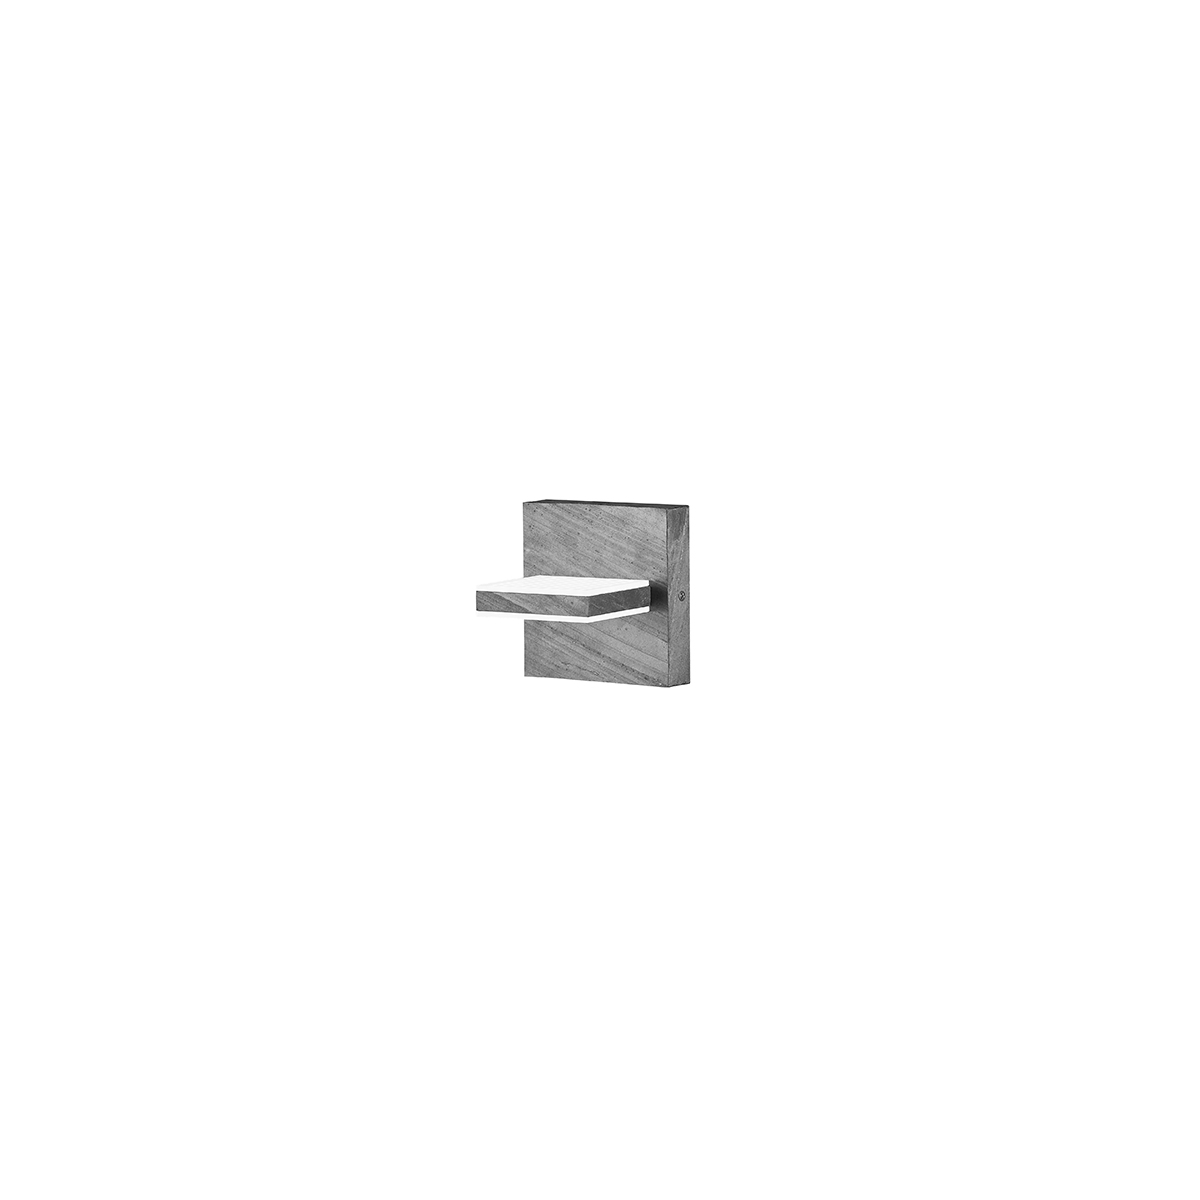 Bankamp Linea Stone LED Wandleuchte 4304/1-75